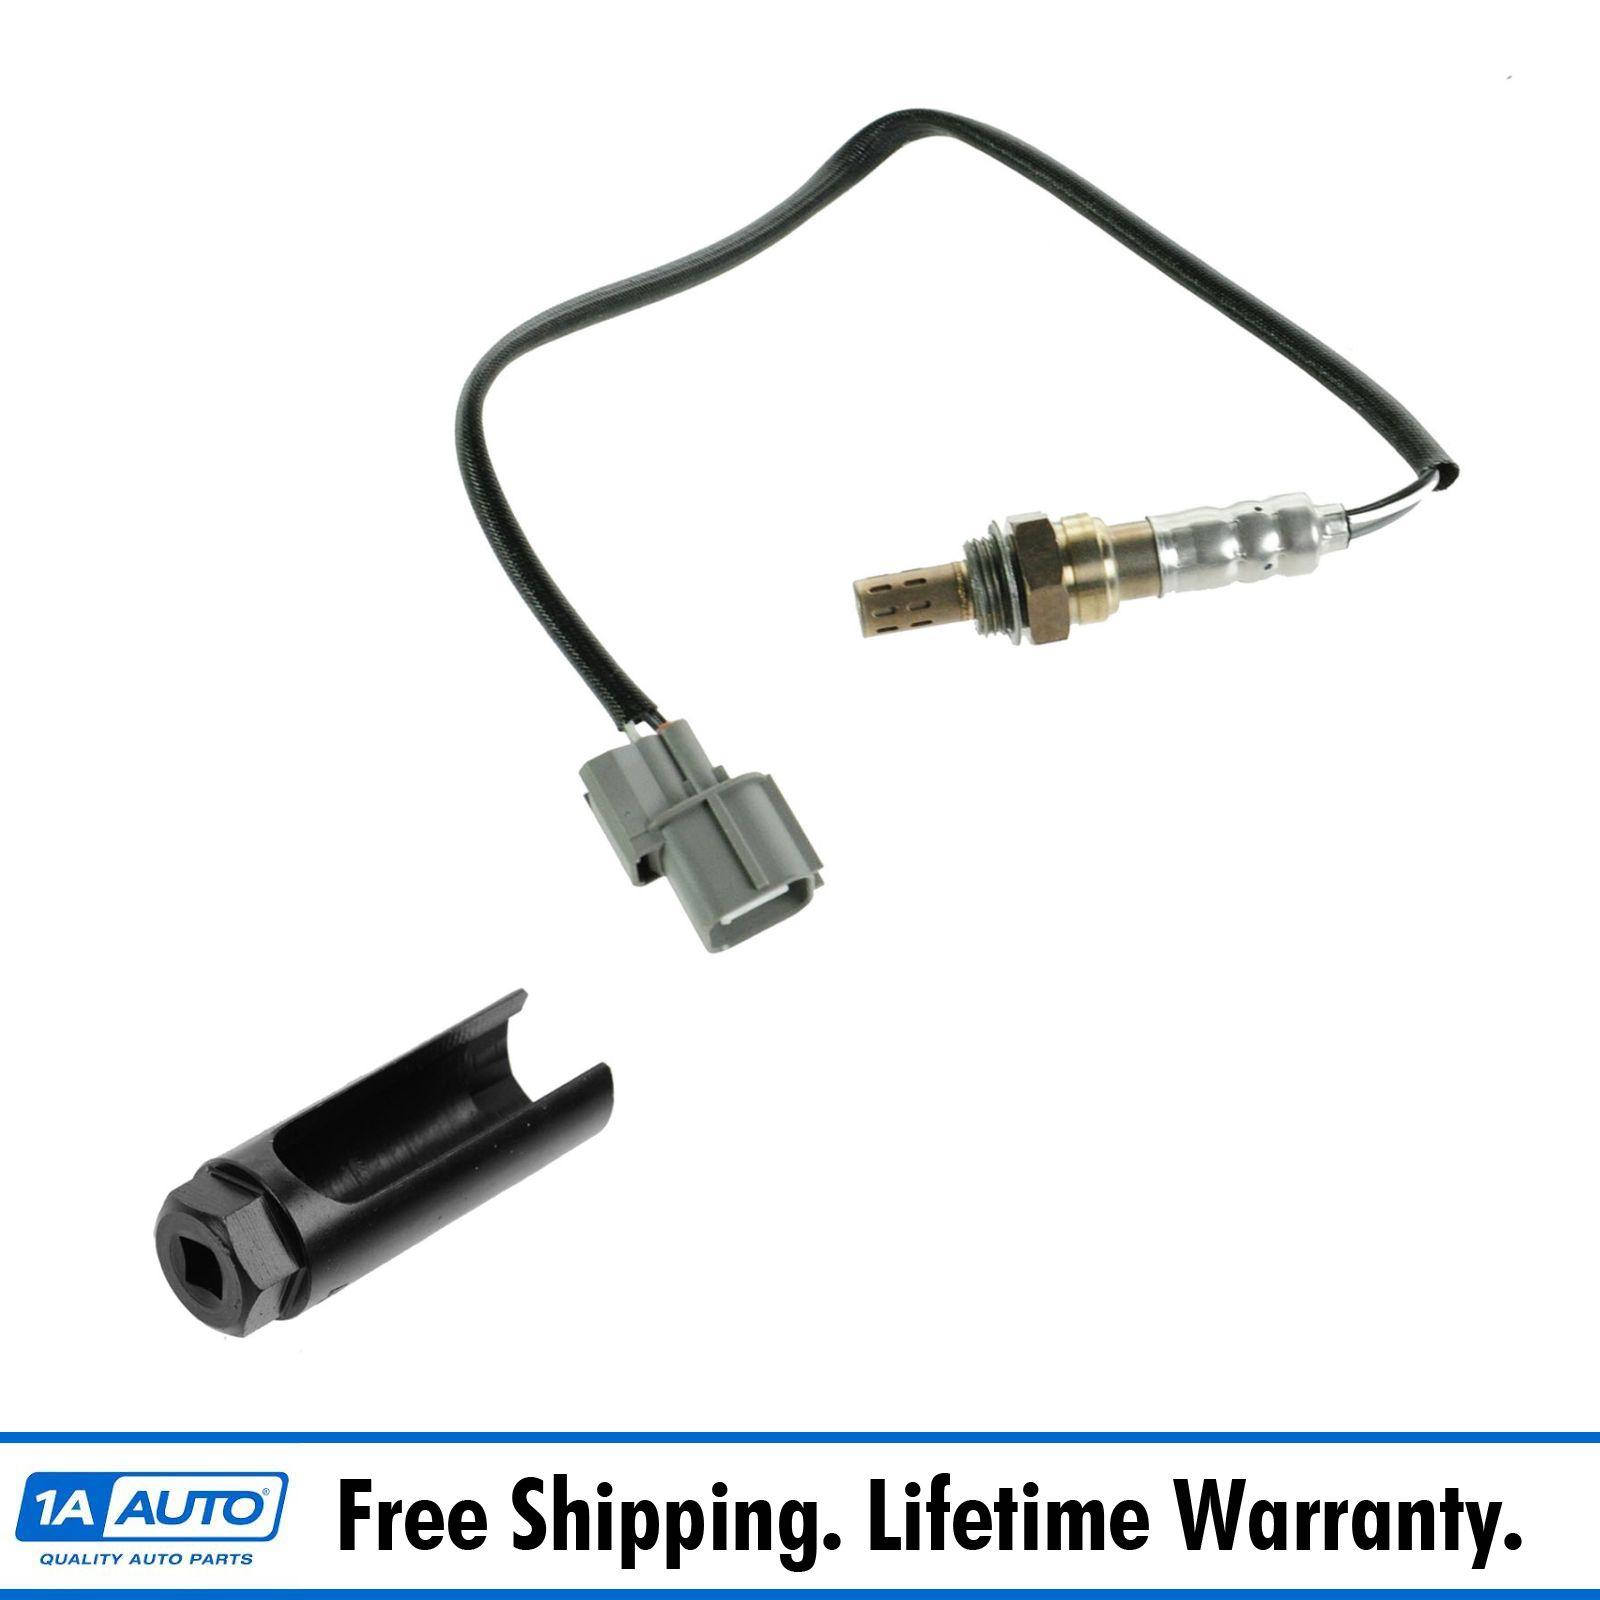 Oxygen O2 Sensor & Socket Tool For Accord Civic Odyssey